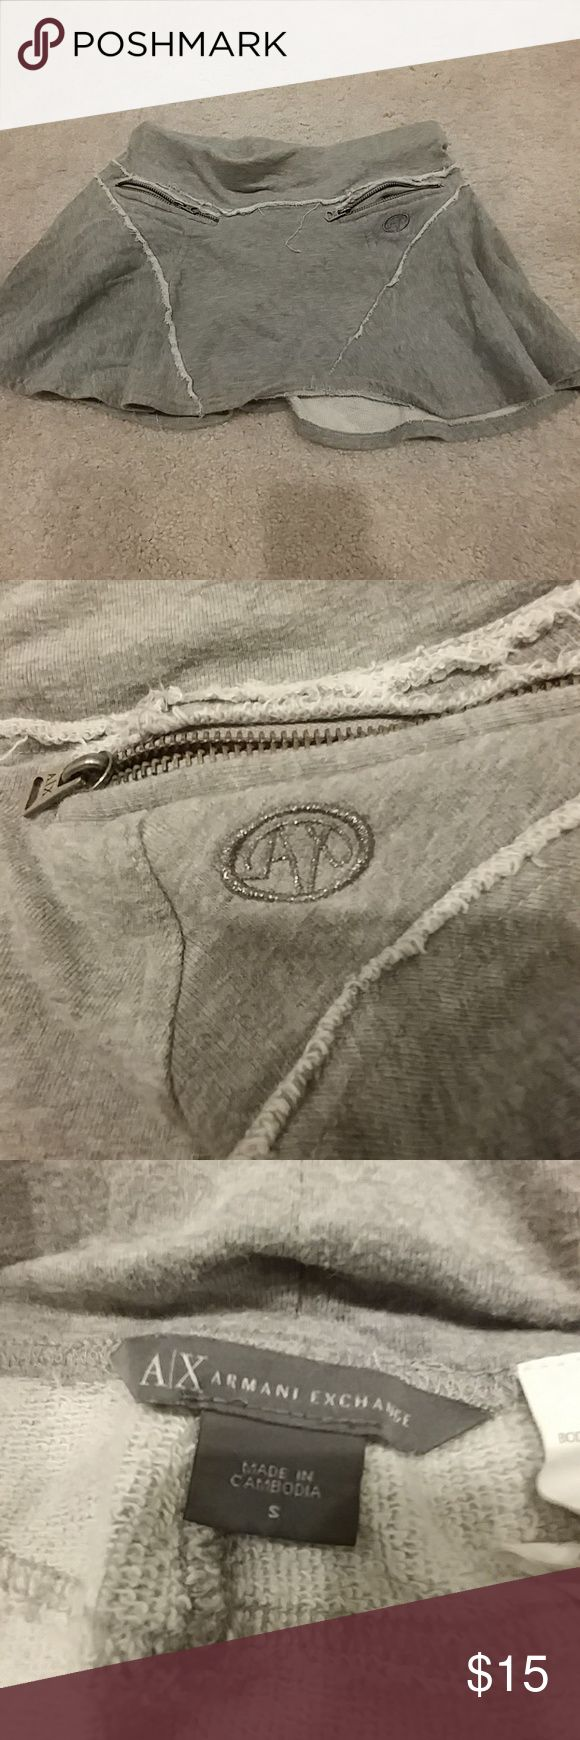 Armani exchange skirt Grey cotton Armani exchange skirt with zipper pocket detailing Armani Exchange Skirts Mini